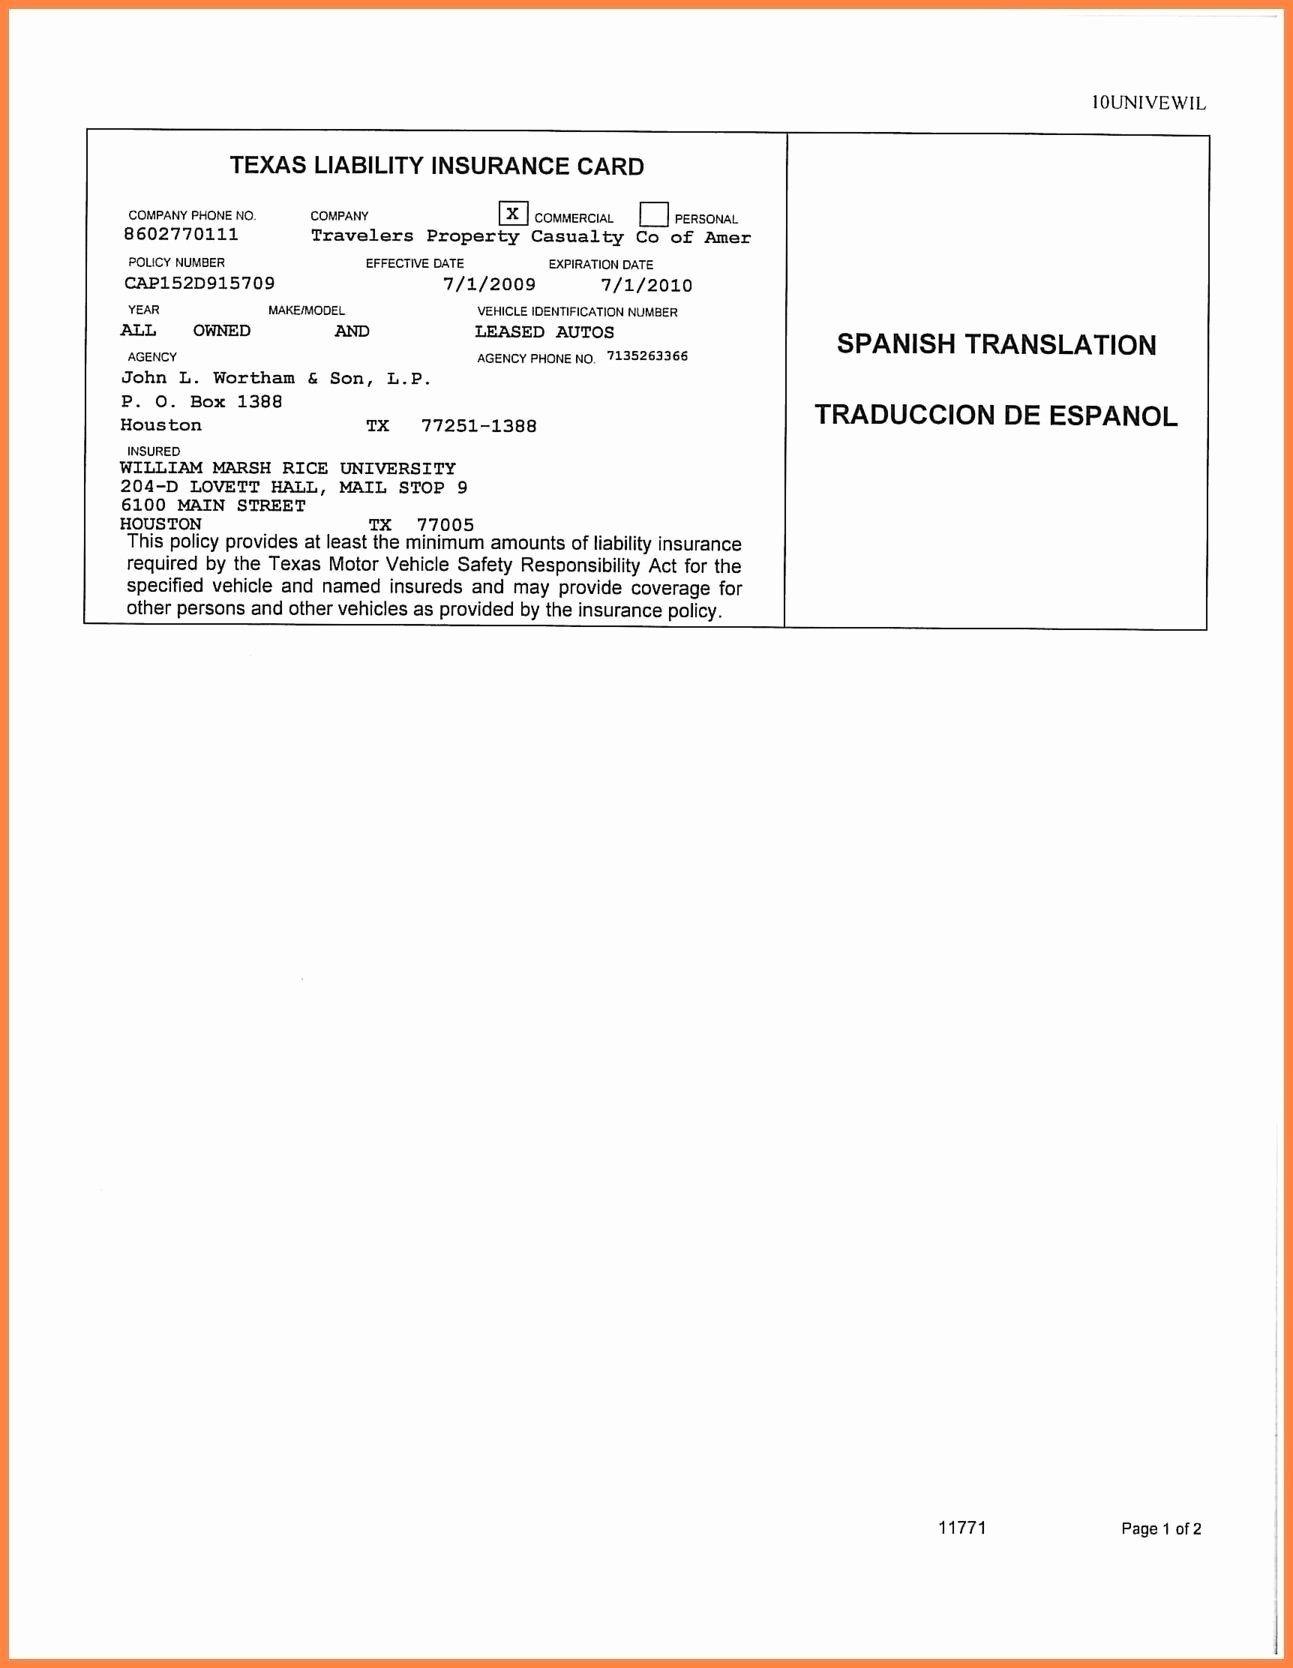 Car Insurance Card Template Free Elegant Car Insurance Card Template Free Auto Insurance Card